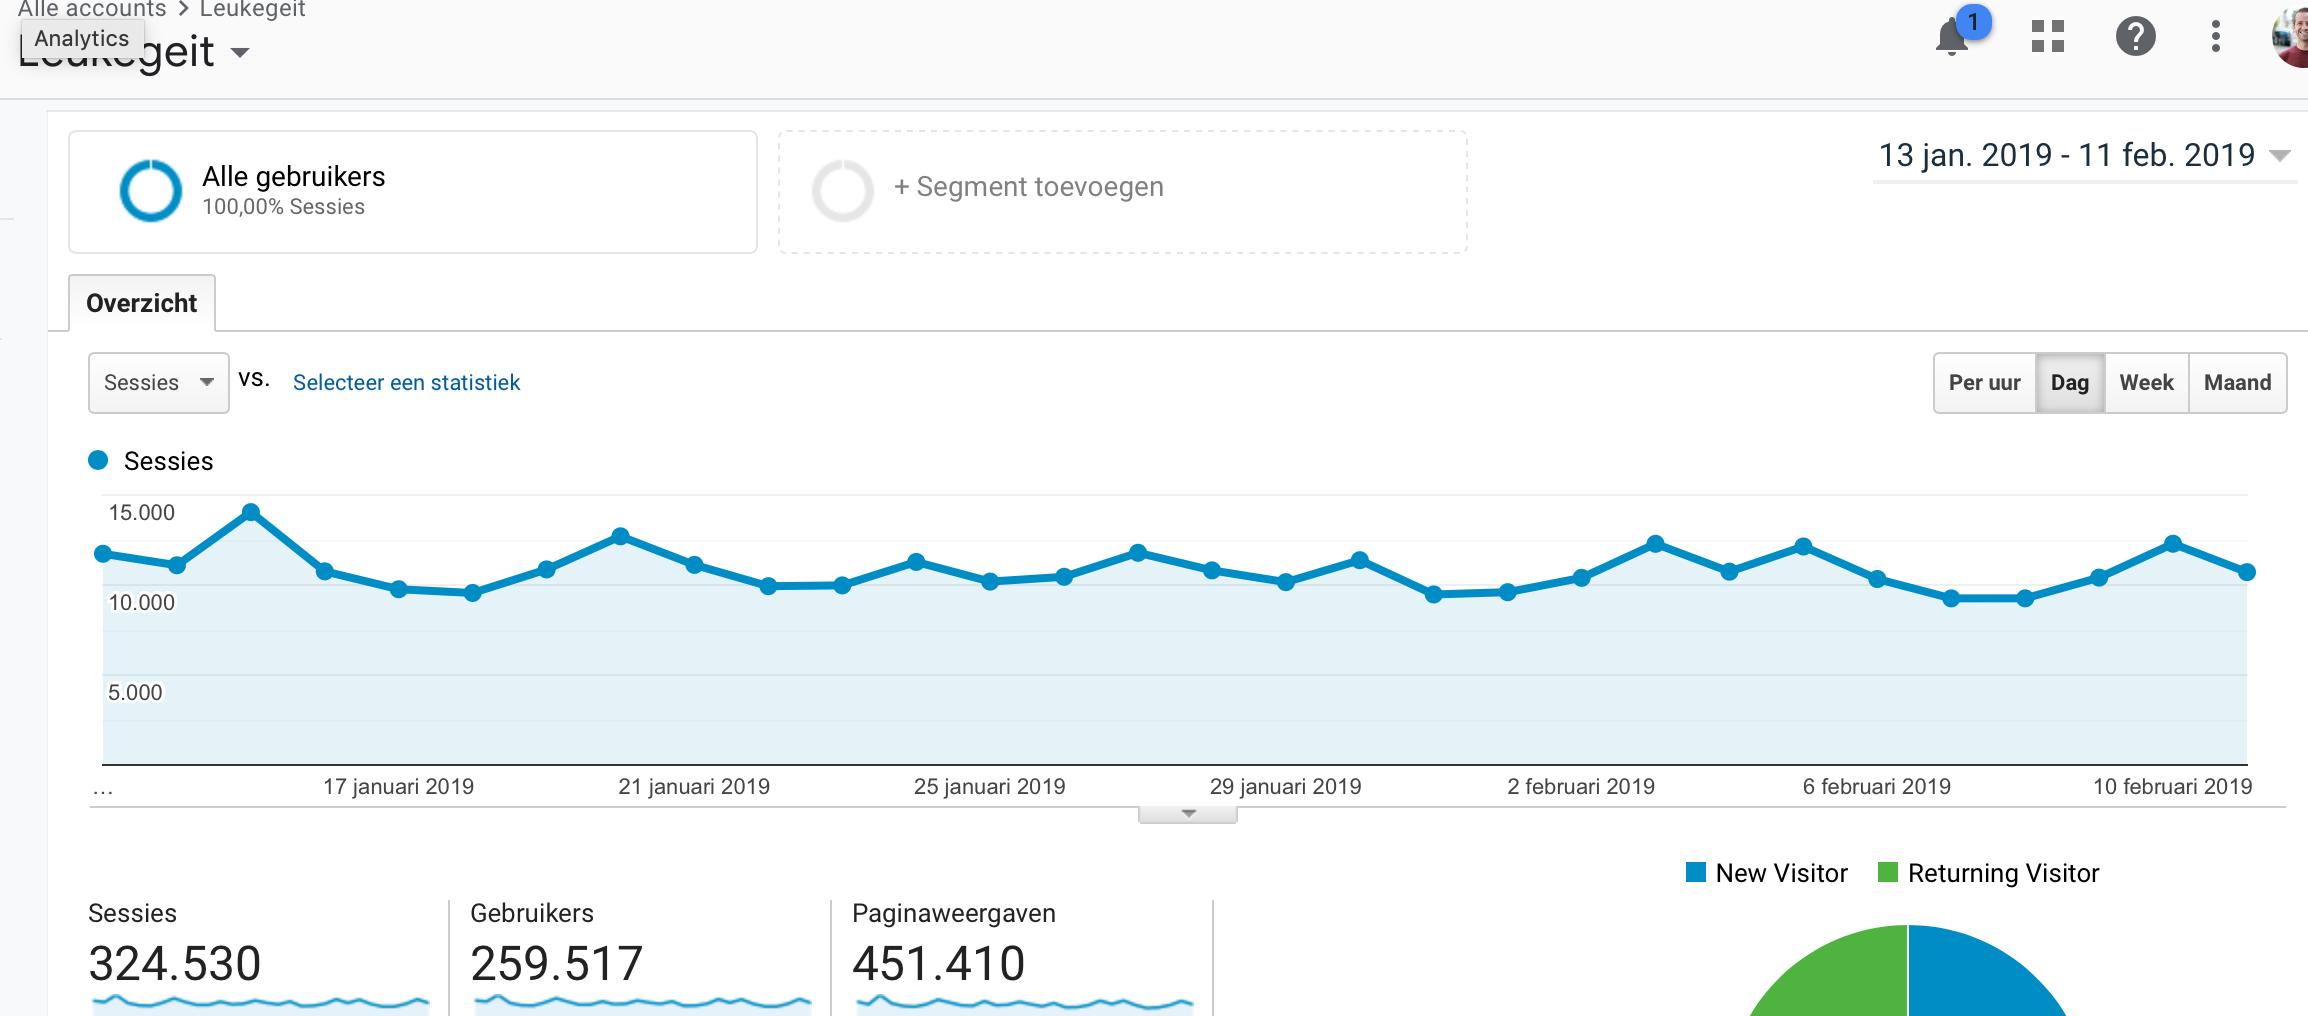 Statistieken Leukegeit.nl